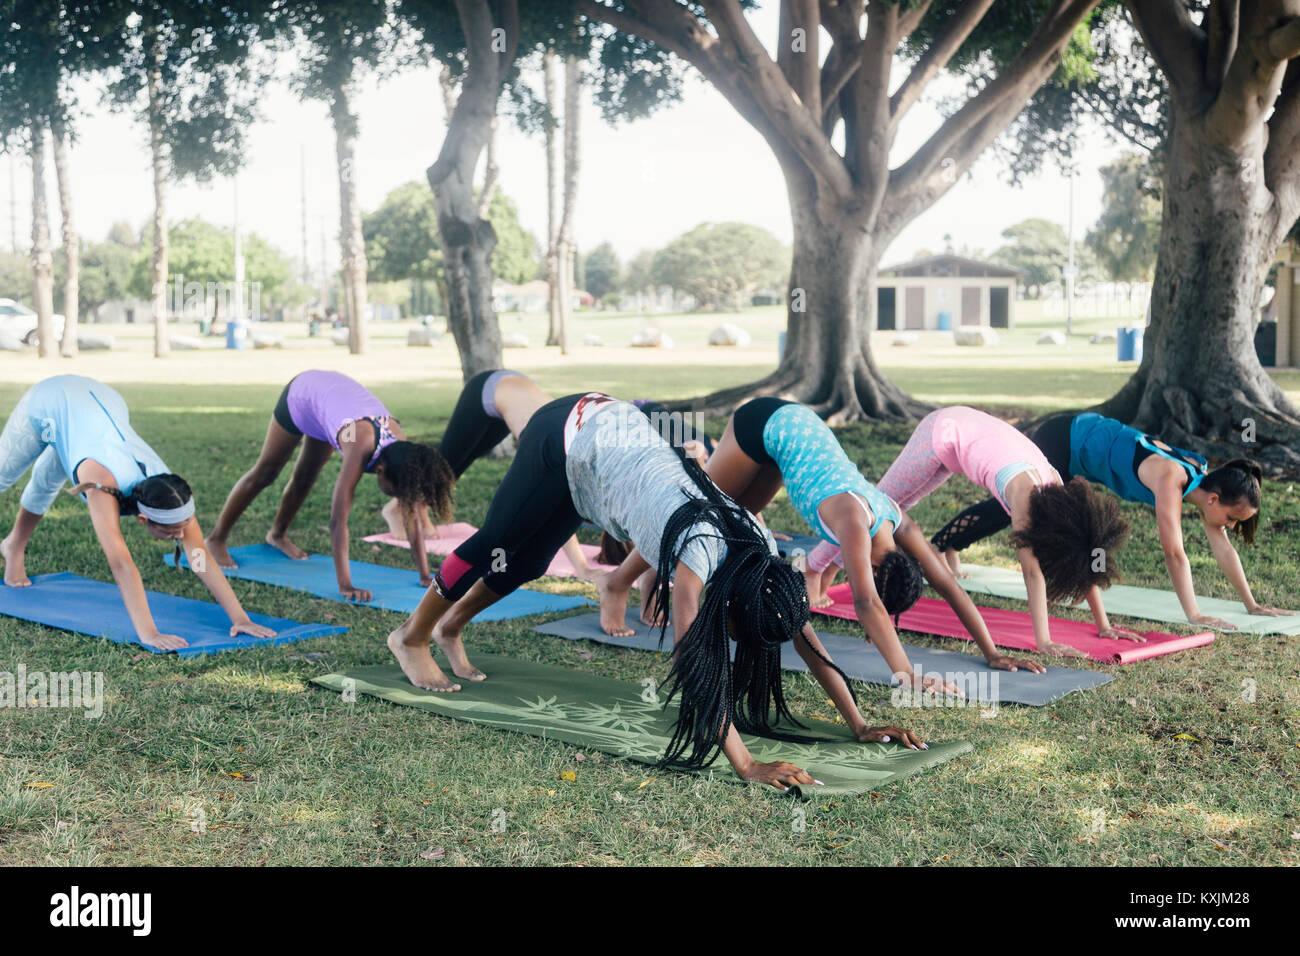 Schoolgirls practicing yoga downward facing dog pose on school sports field - Stock Image